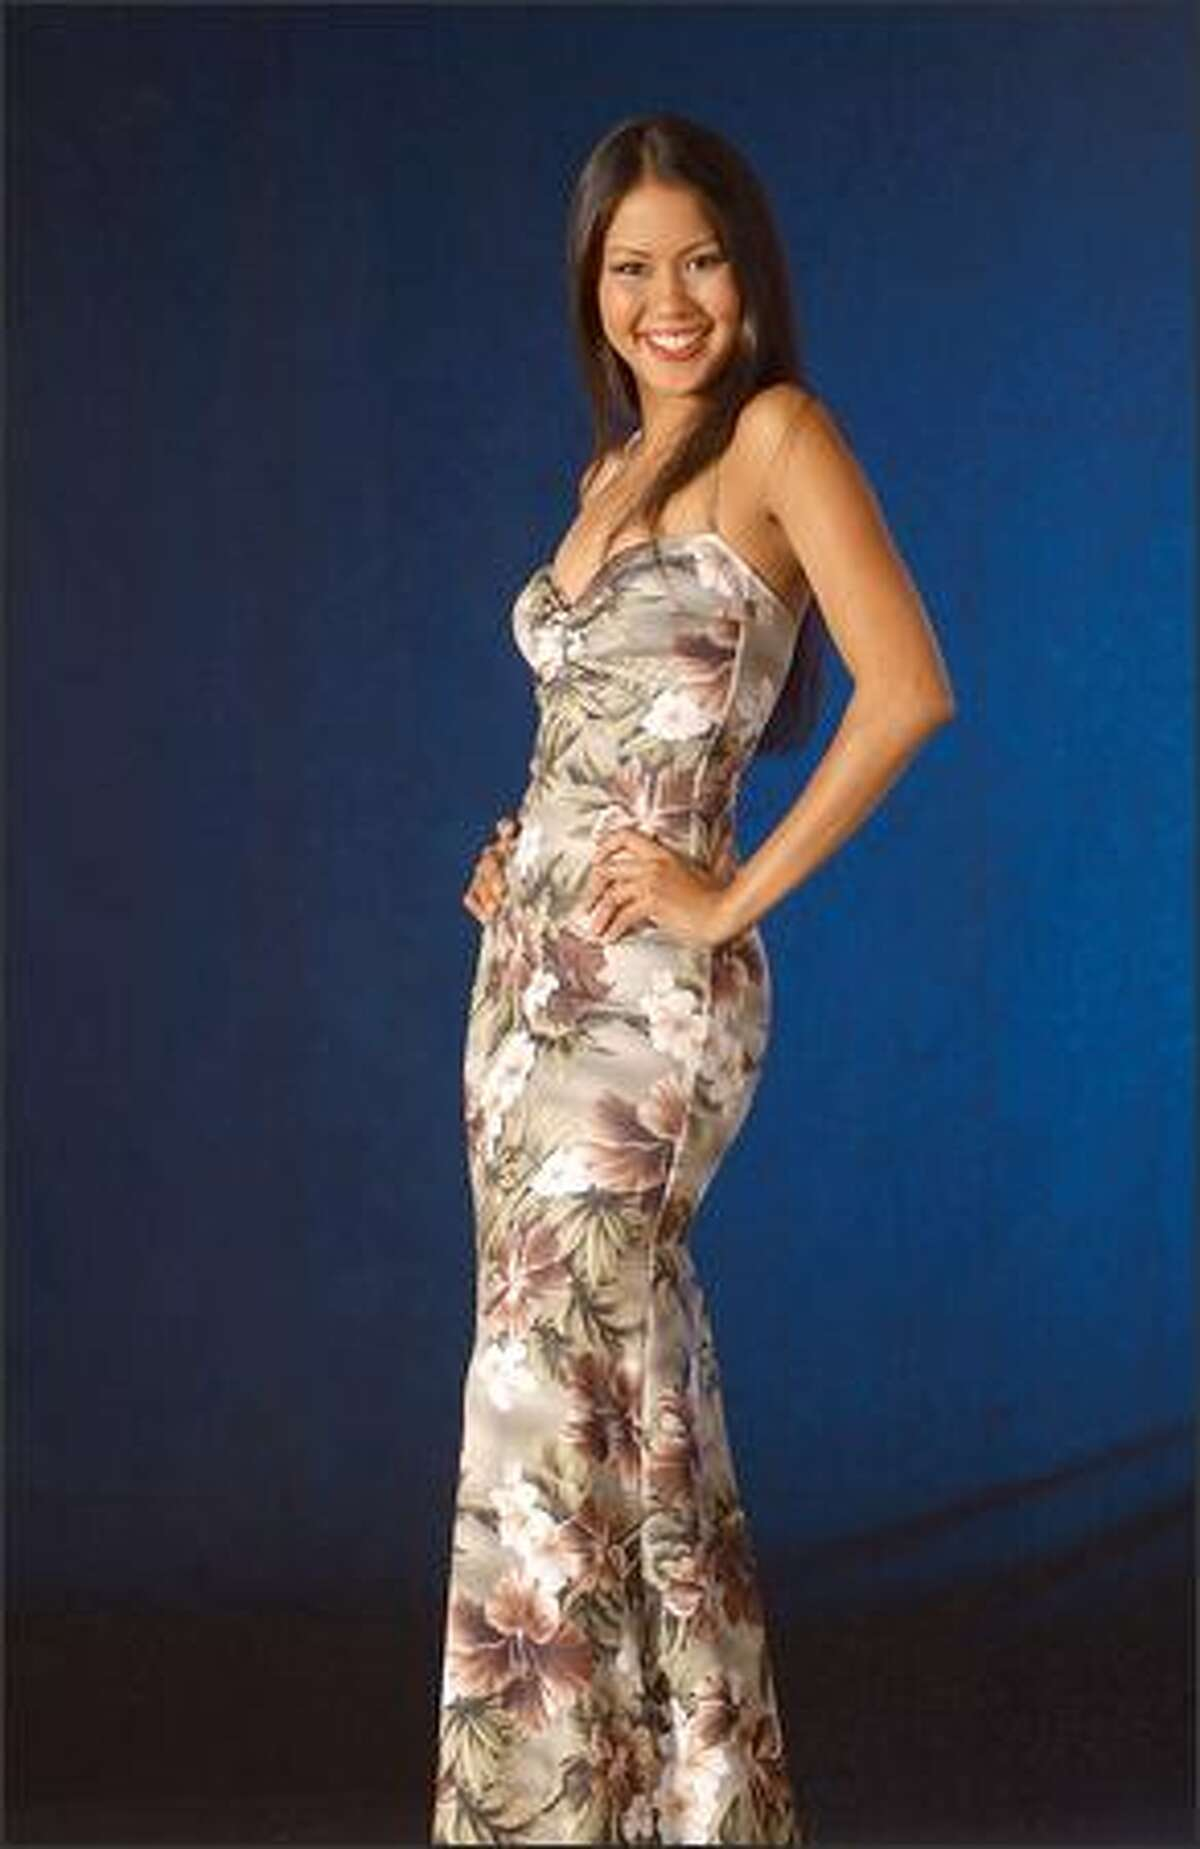 Zizi Lee, Miss Aruba.